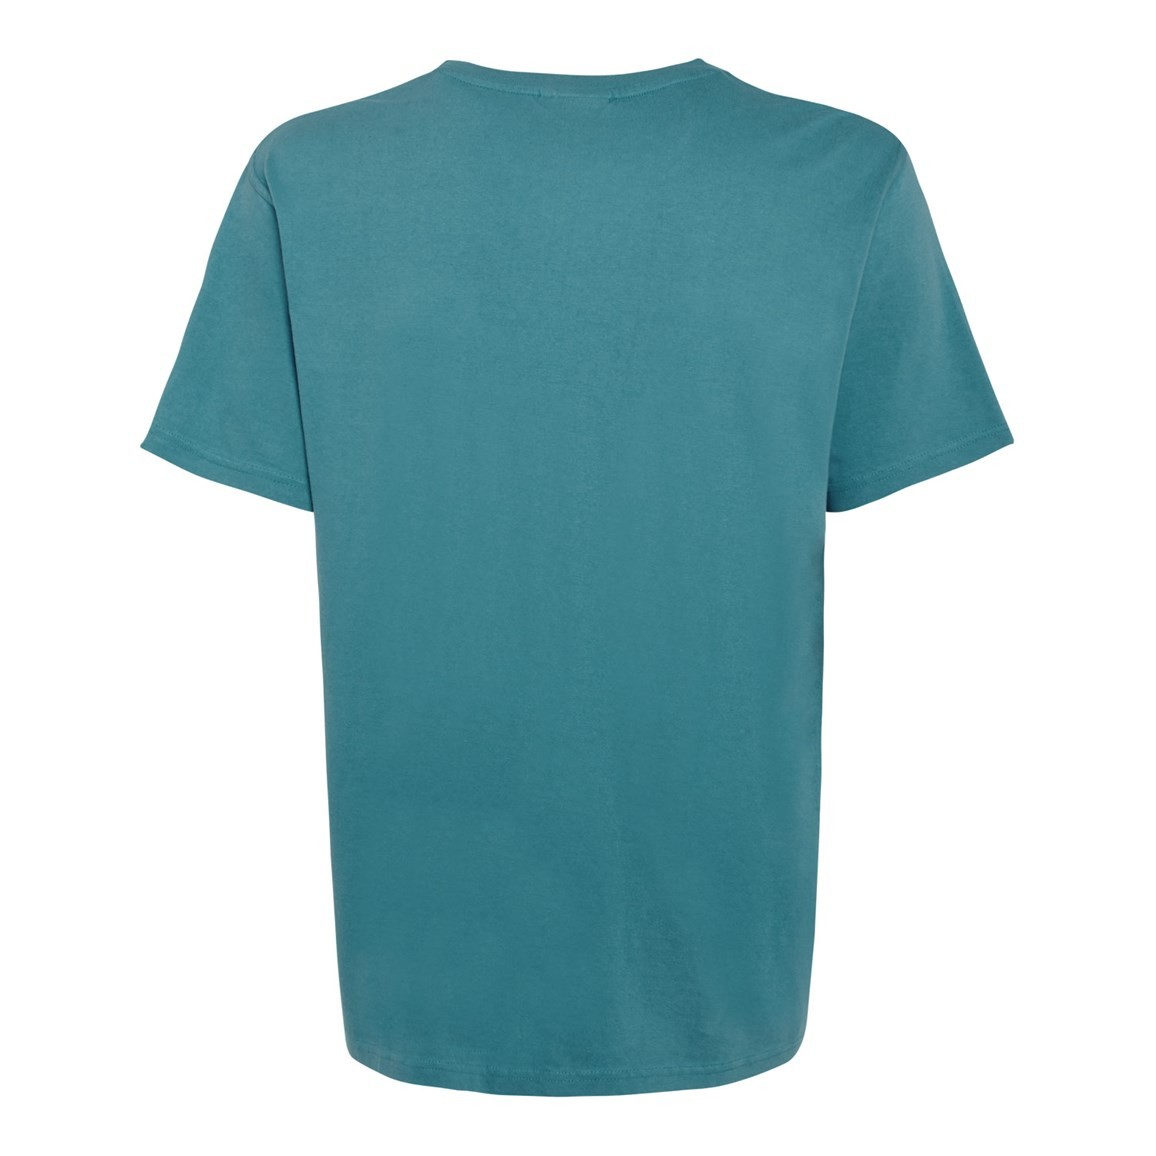 Bones Embroidered Logo Classic Plain T Shirt Adriatic Blue